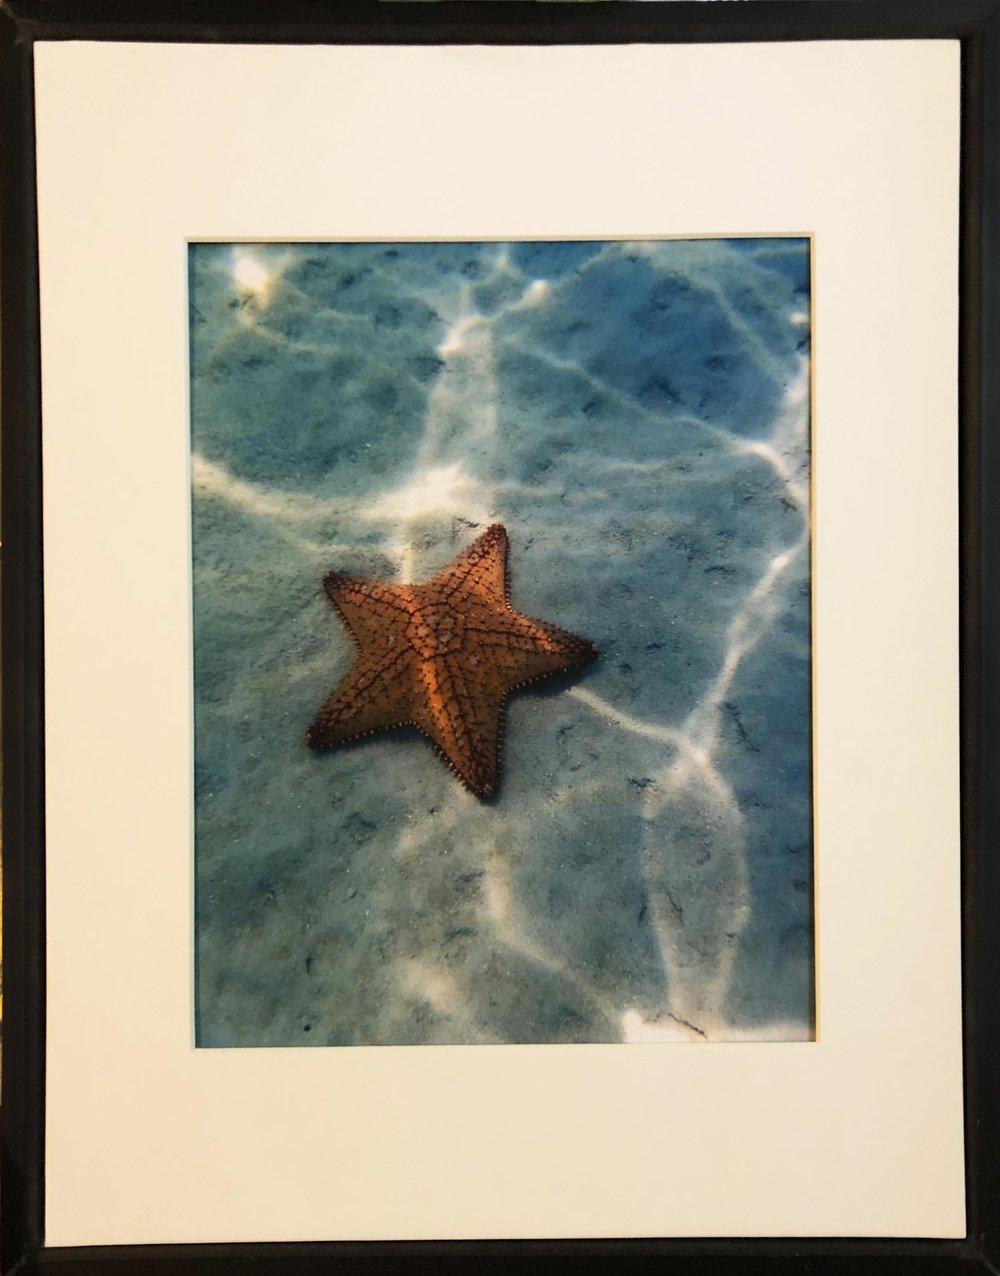 """Underwater Starfish"" by Jett Saustrup"